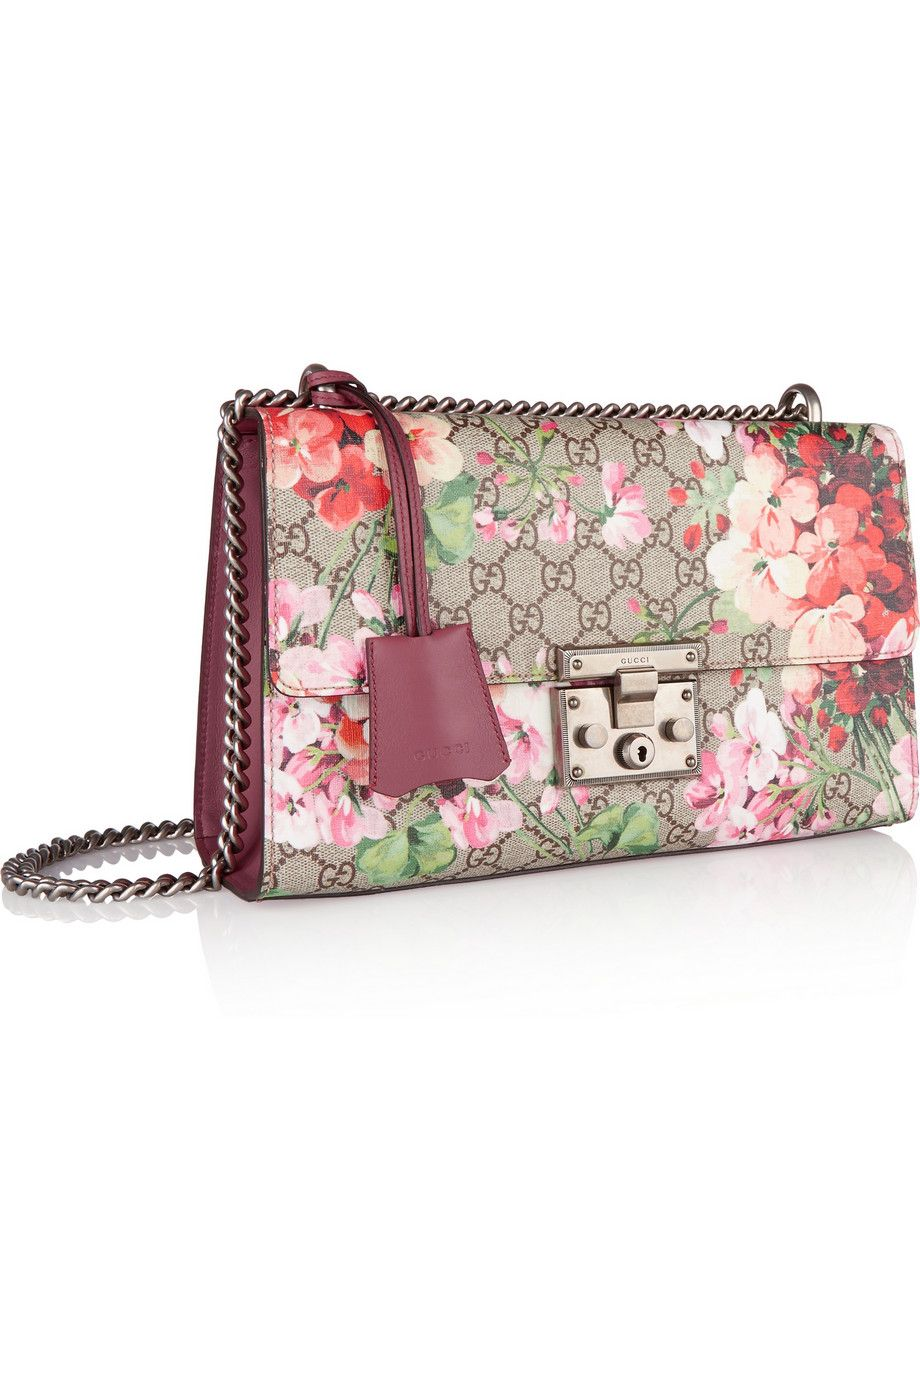 Gucci | Linea C large coated canvas and leather shoulder bag | NET-A-PORTER.COM